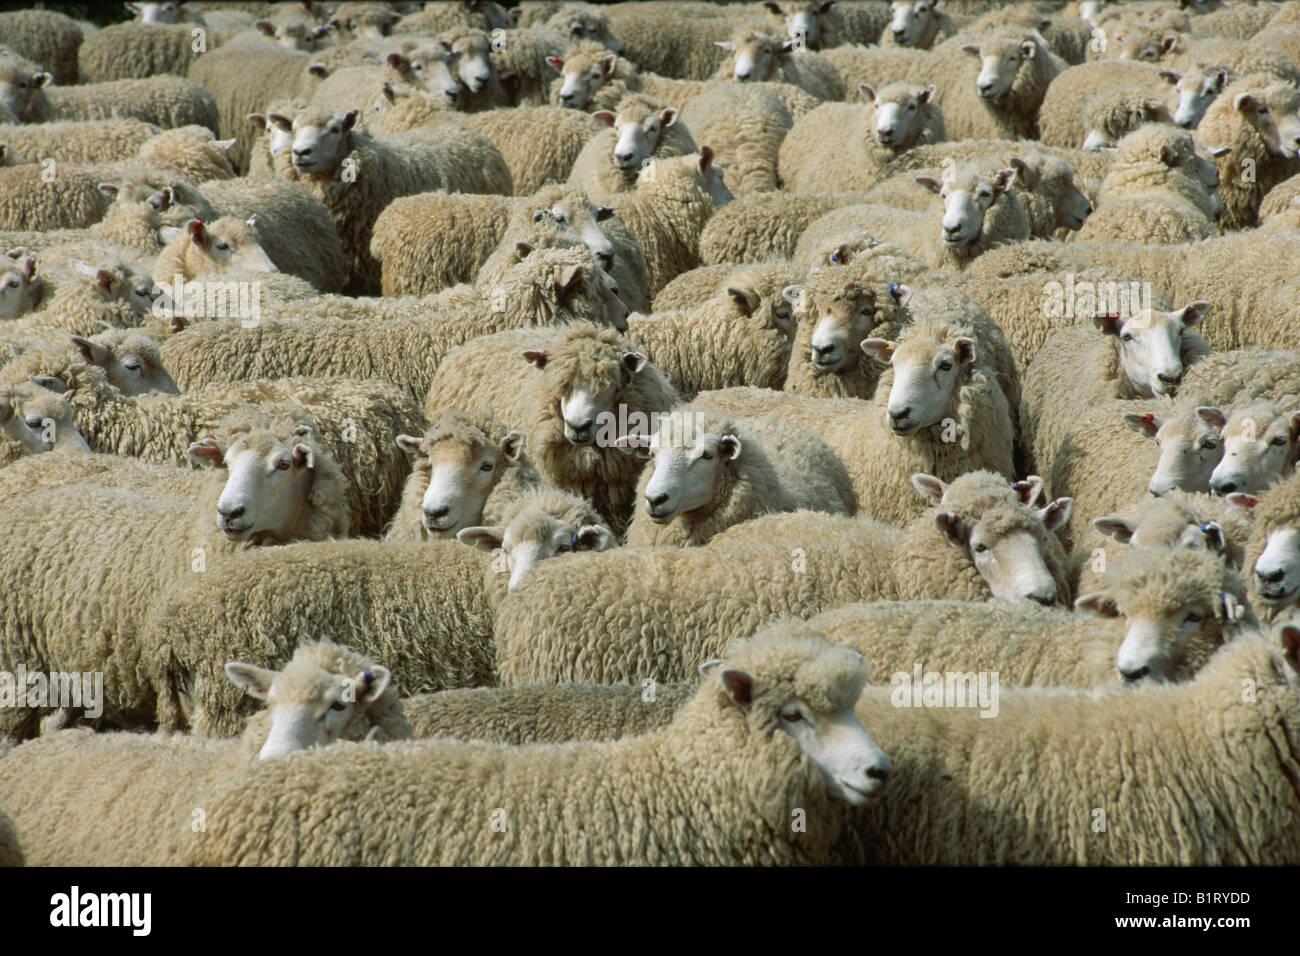 A herd of Merino Sheep (Ovis orientalis aries), North Island, New Zealand - Stock Image